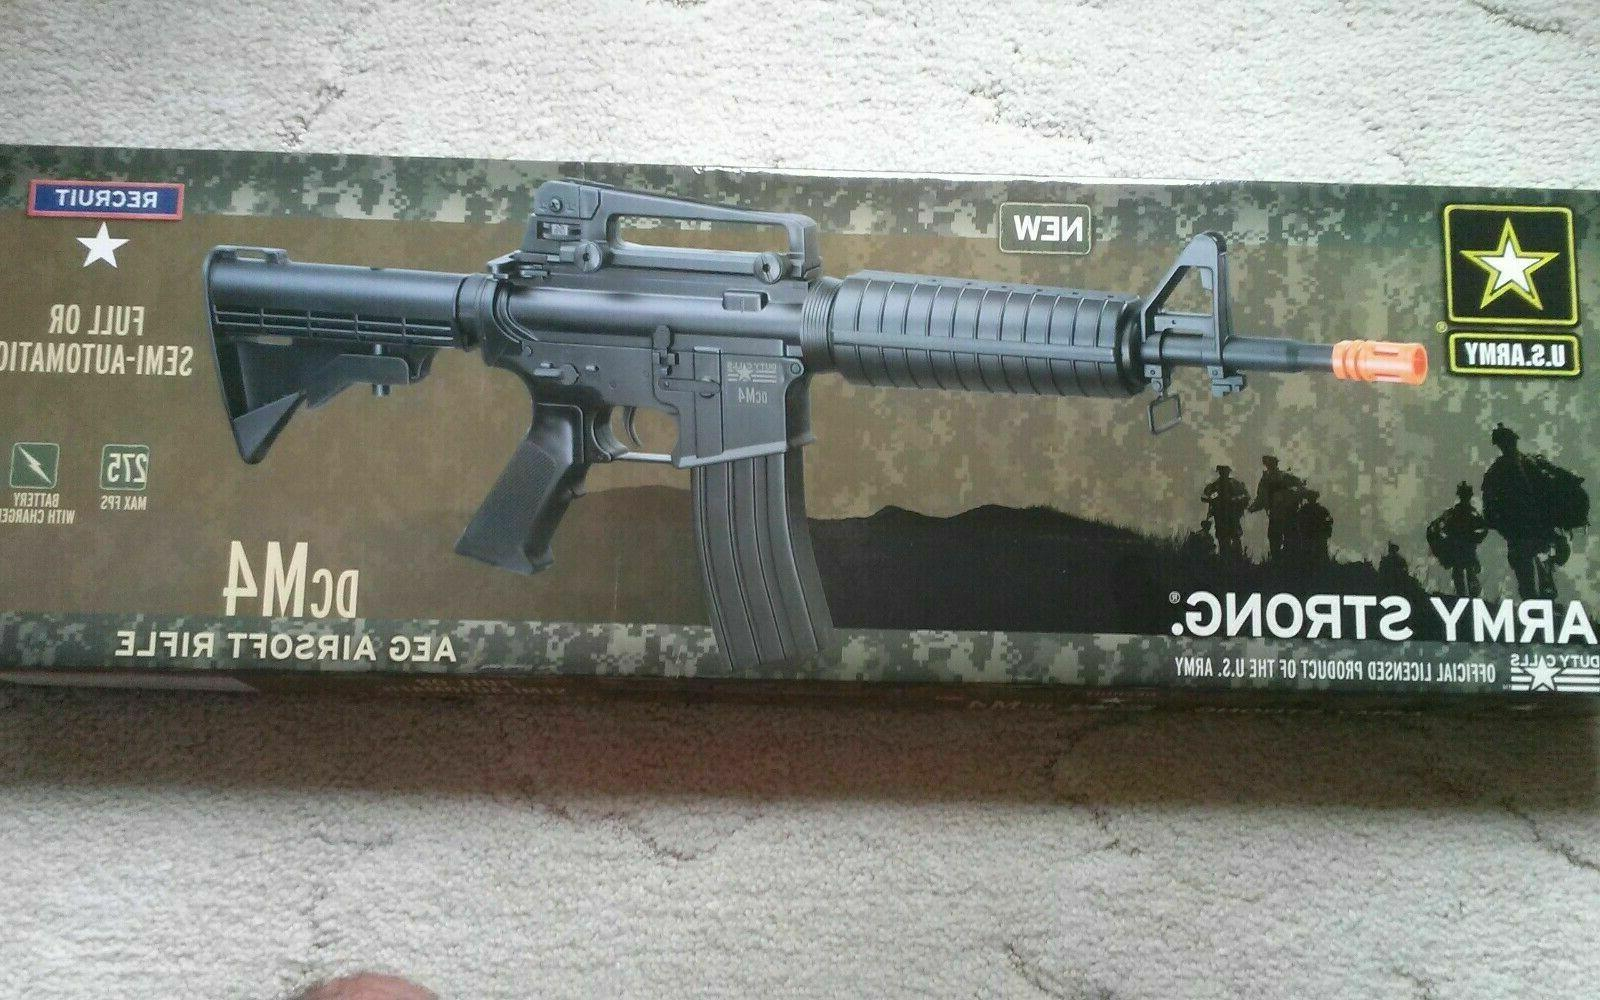 Crosman DCM4 Duty Calls AEG US Army airsoft rifle NEW